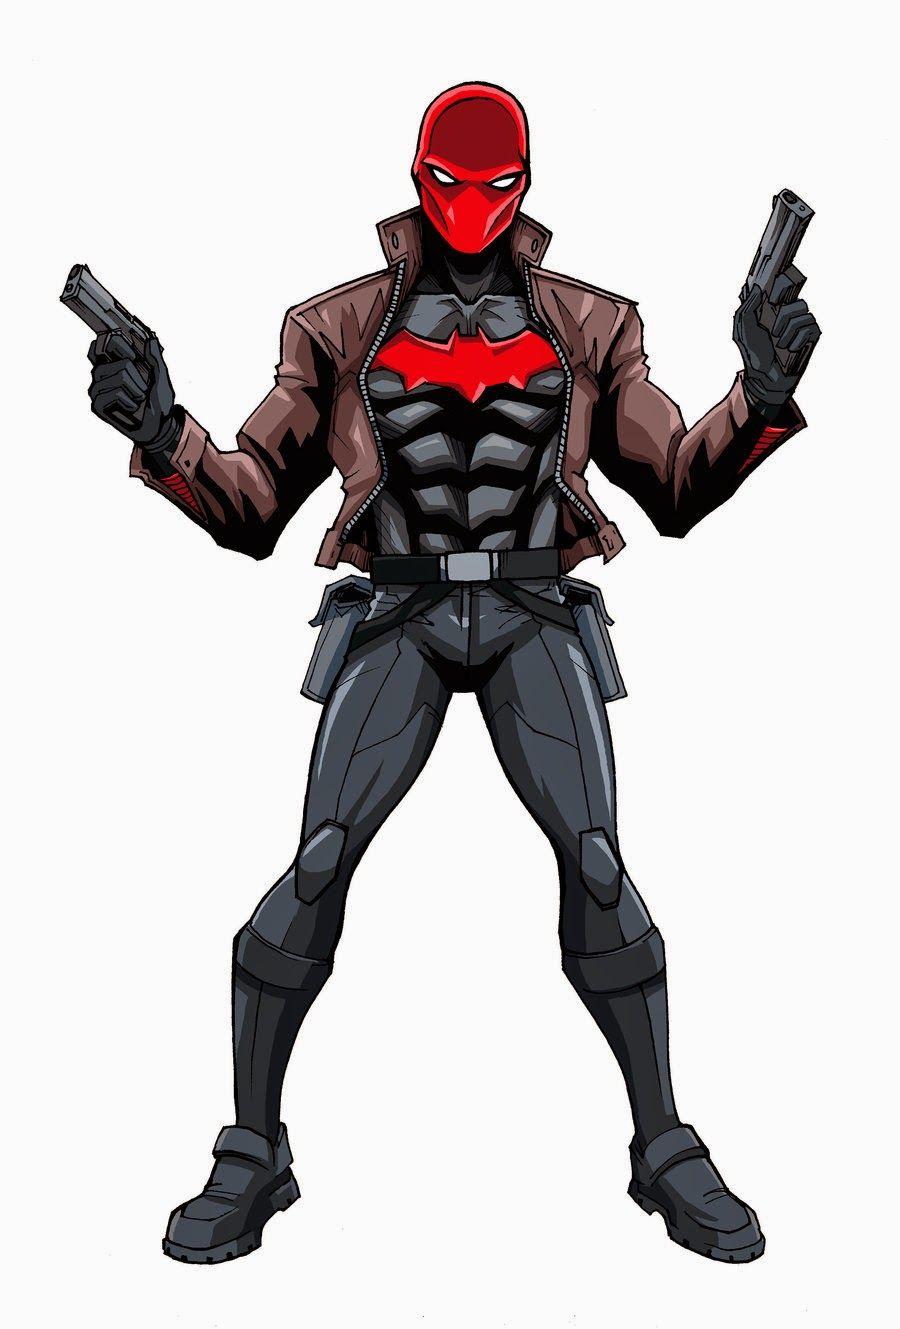 Futuro Proyecto Cosplay En 2020 Capucha Roja Dibujos Comics Marvel Dc